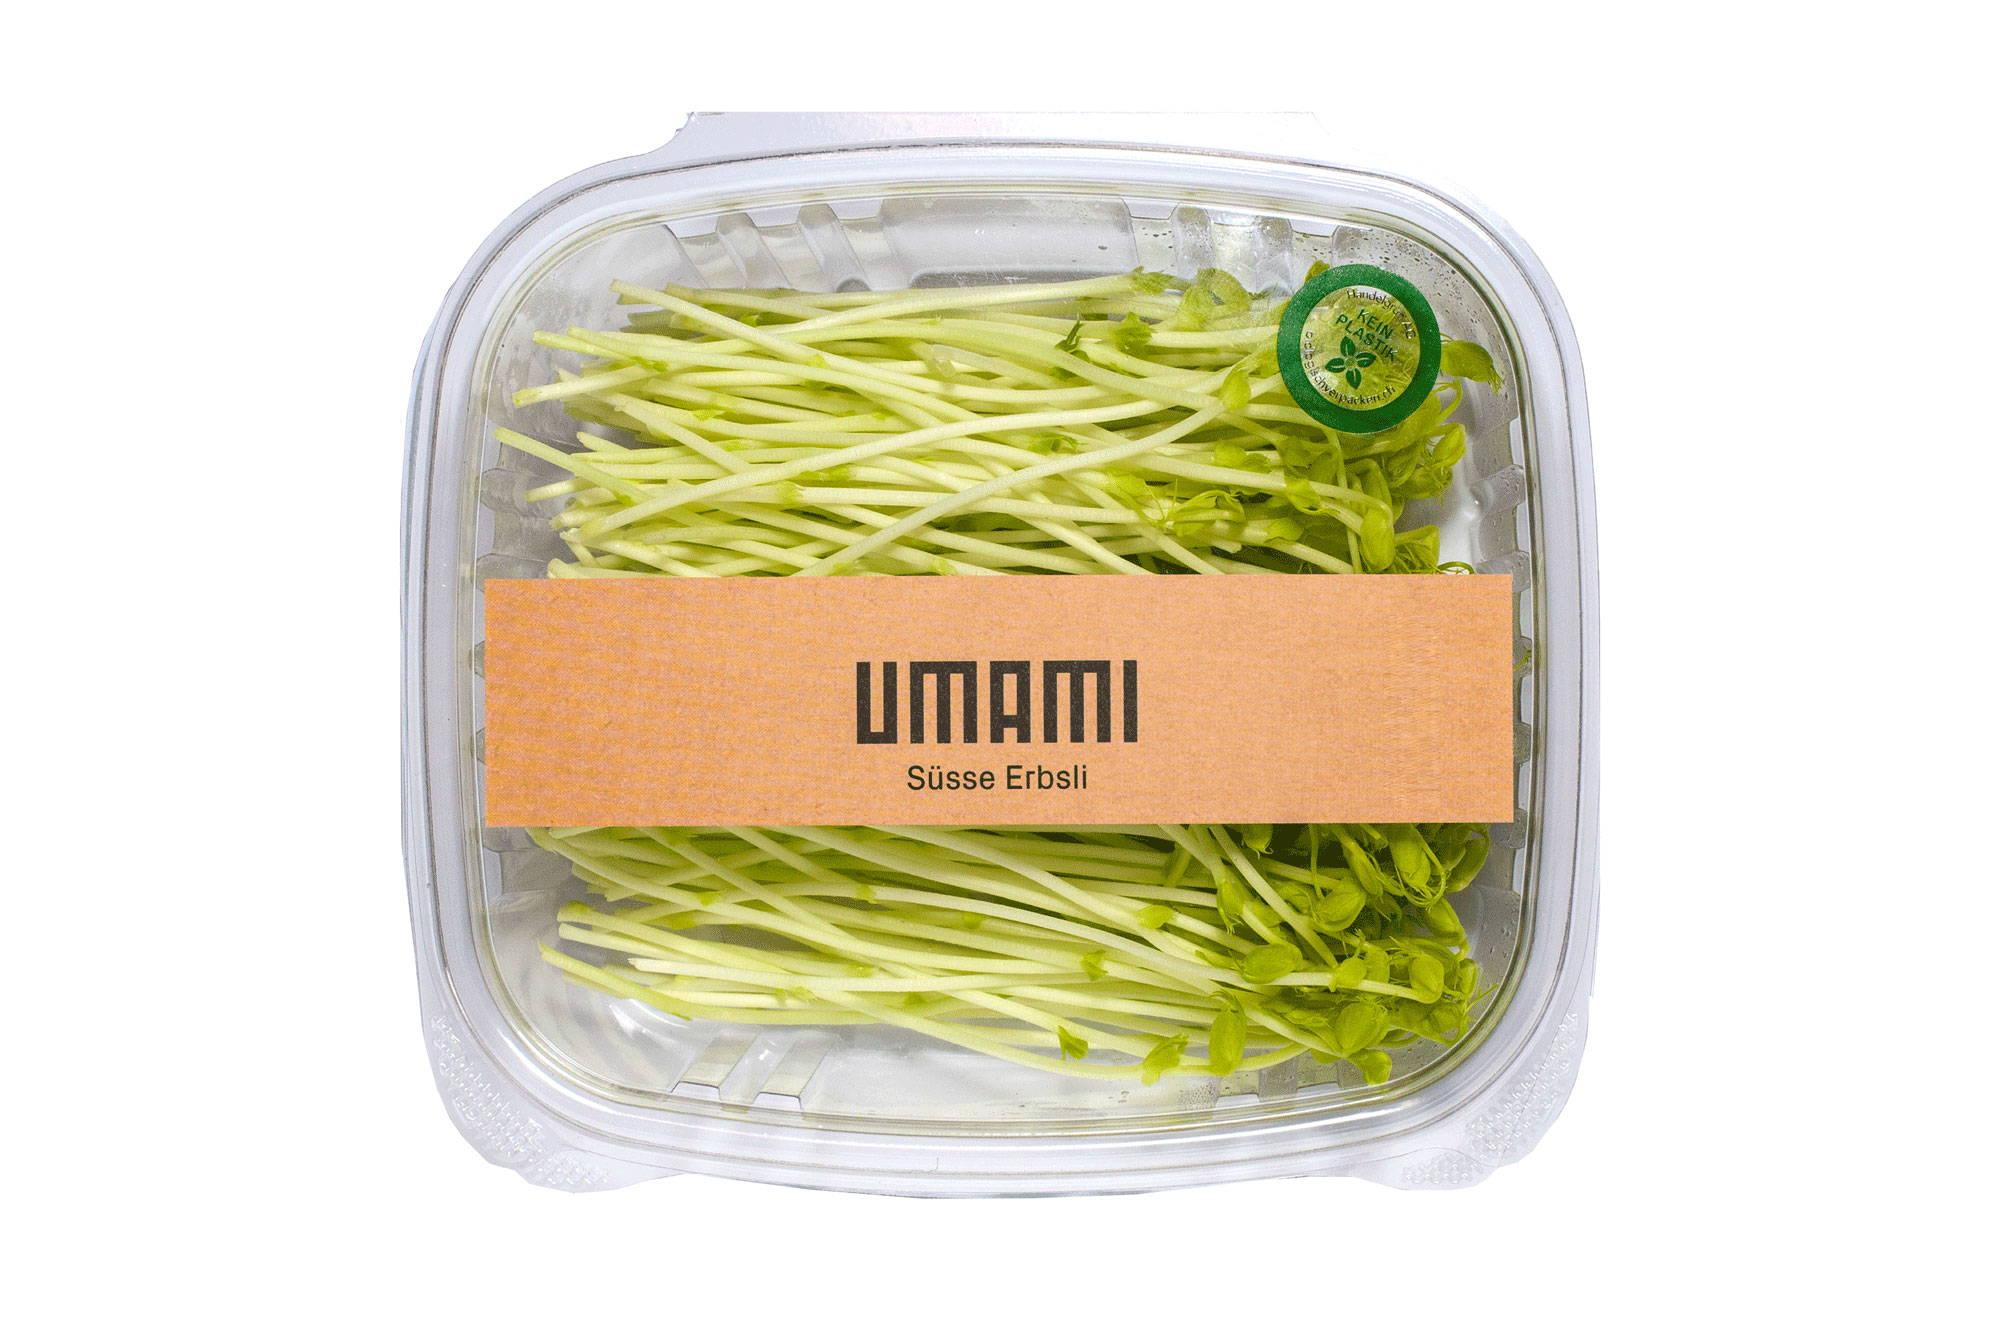 Süsse Erbsli UMAMI Microgreens. Süss und knackig im Geschmack.